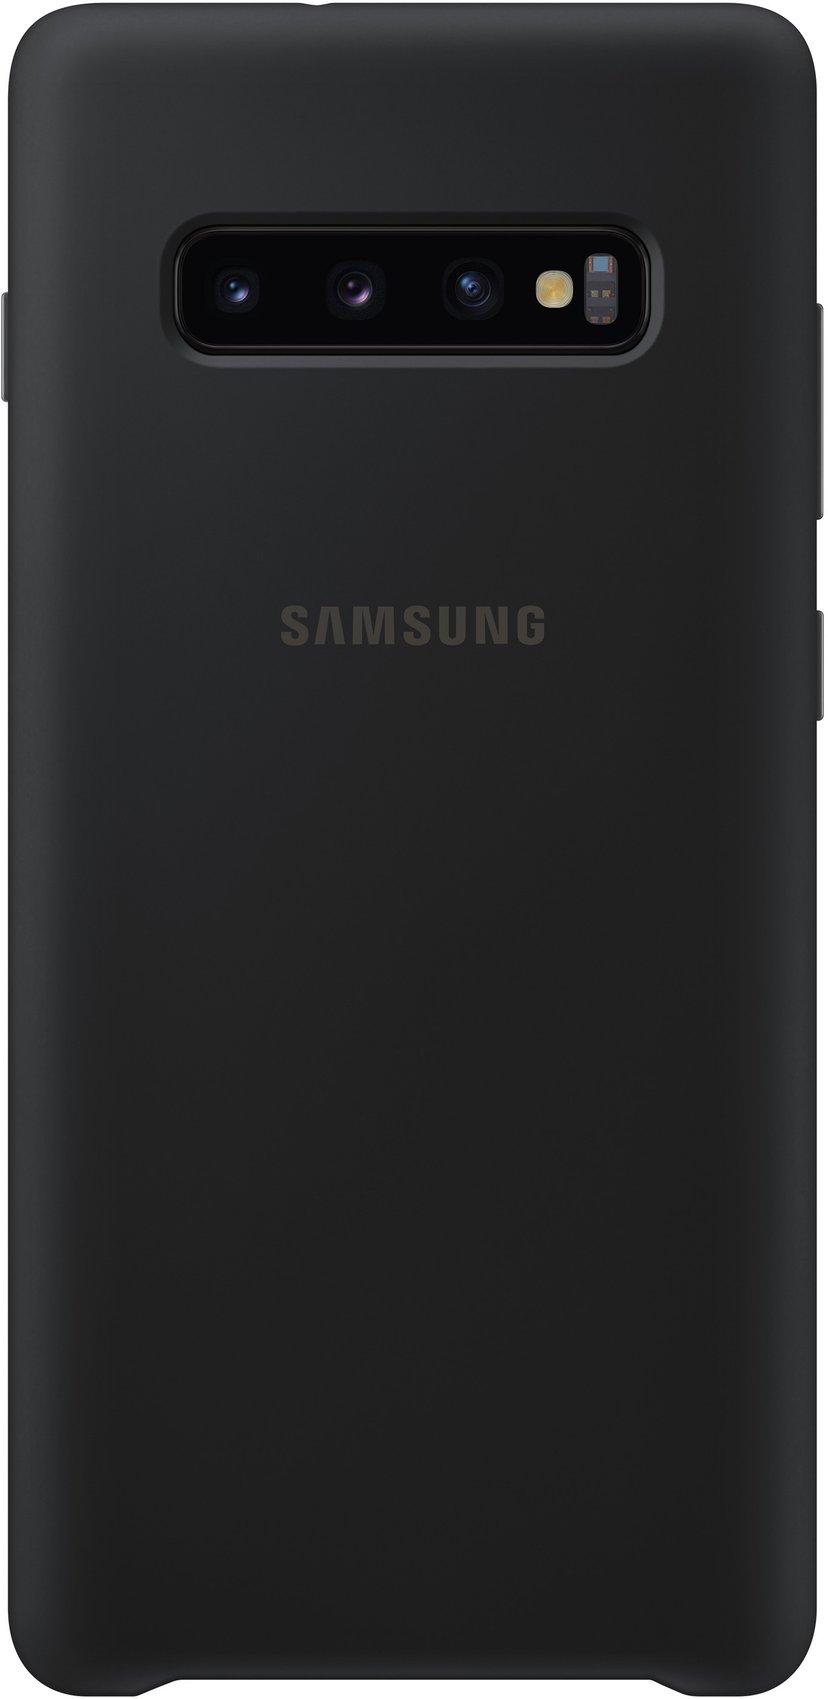 Samsung Silicone Cover EF-PG975 Samsung Galaxy S10+ Musta